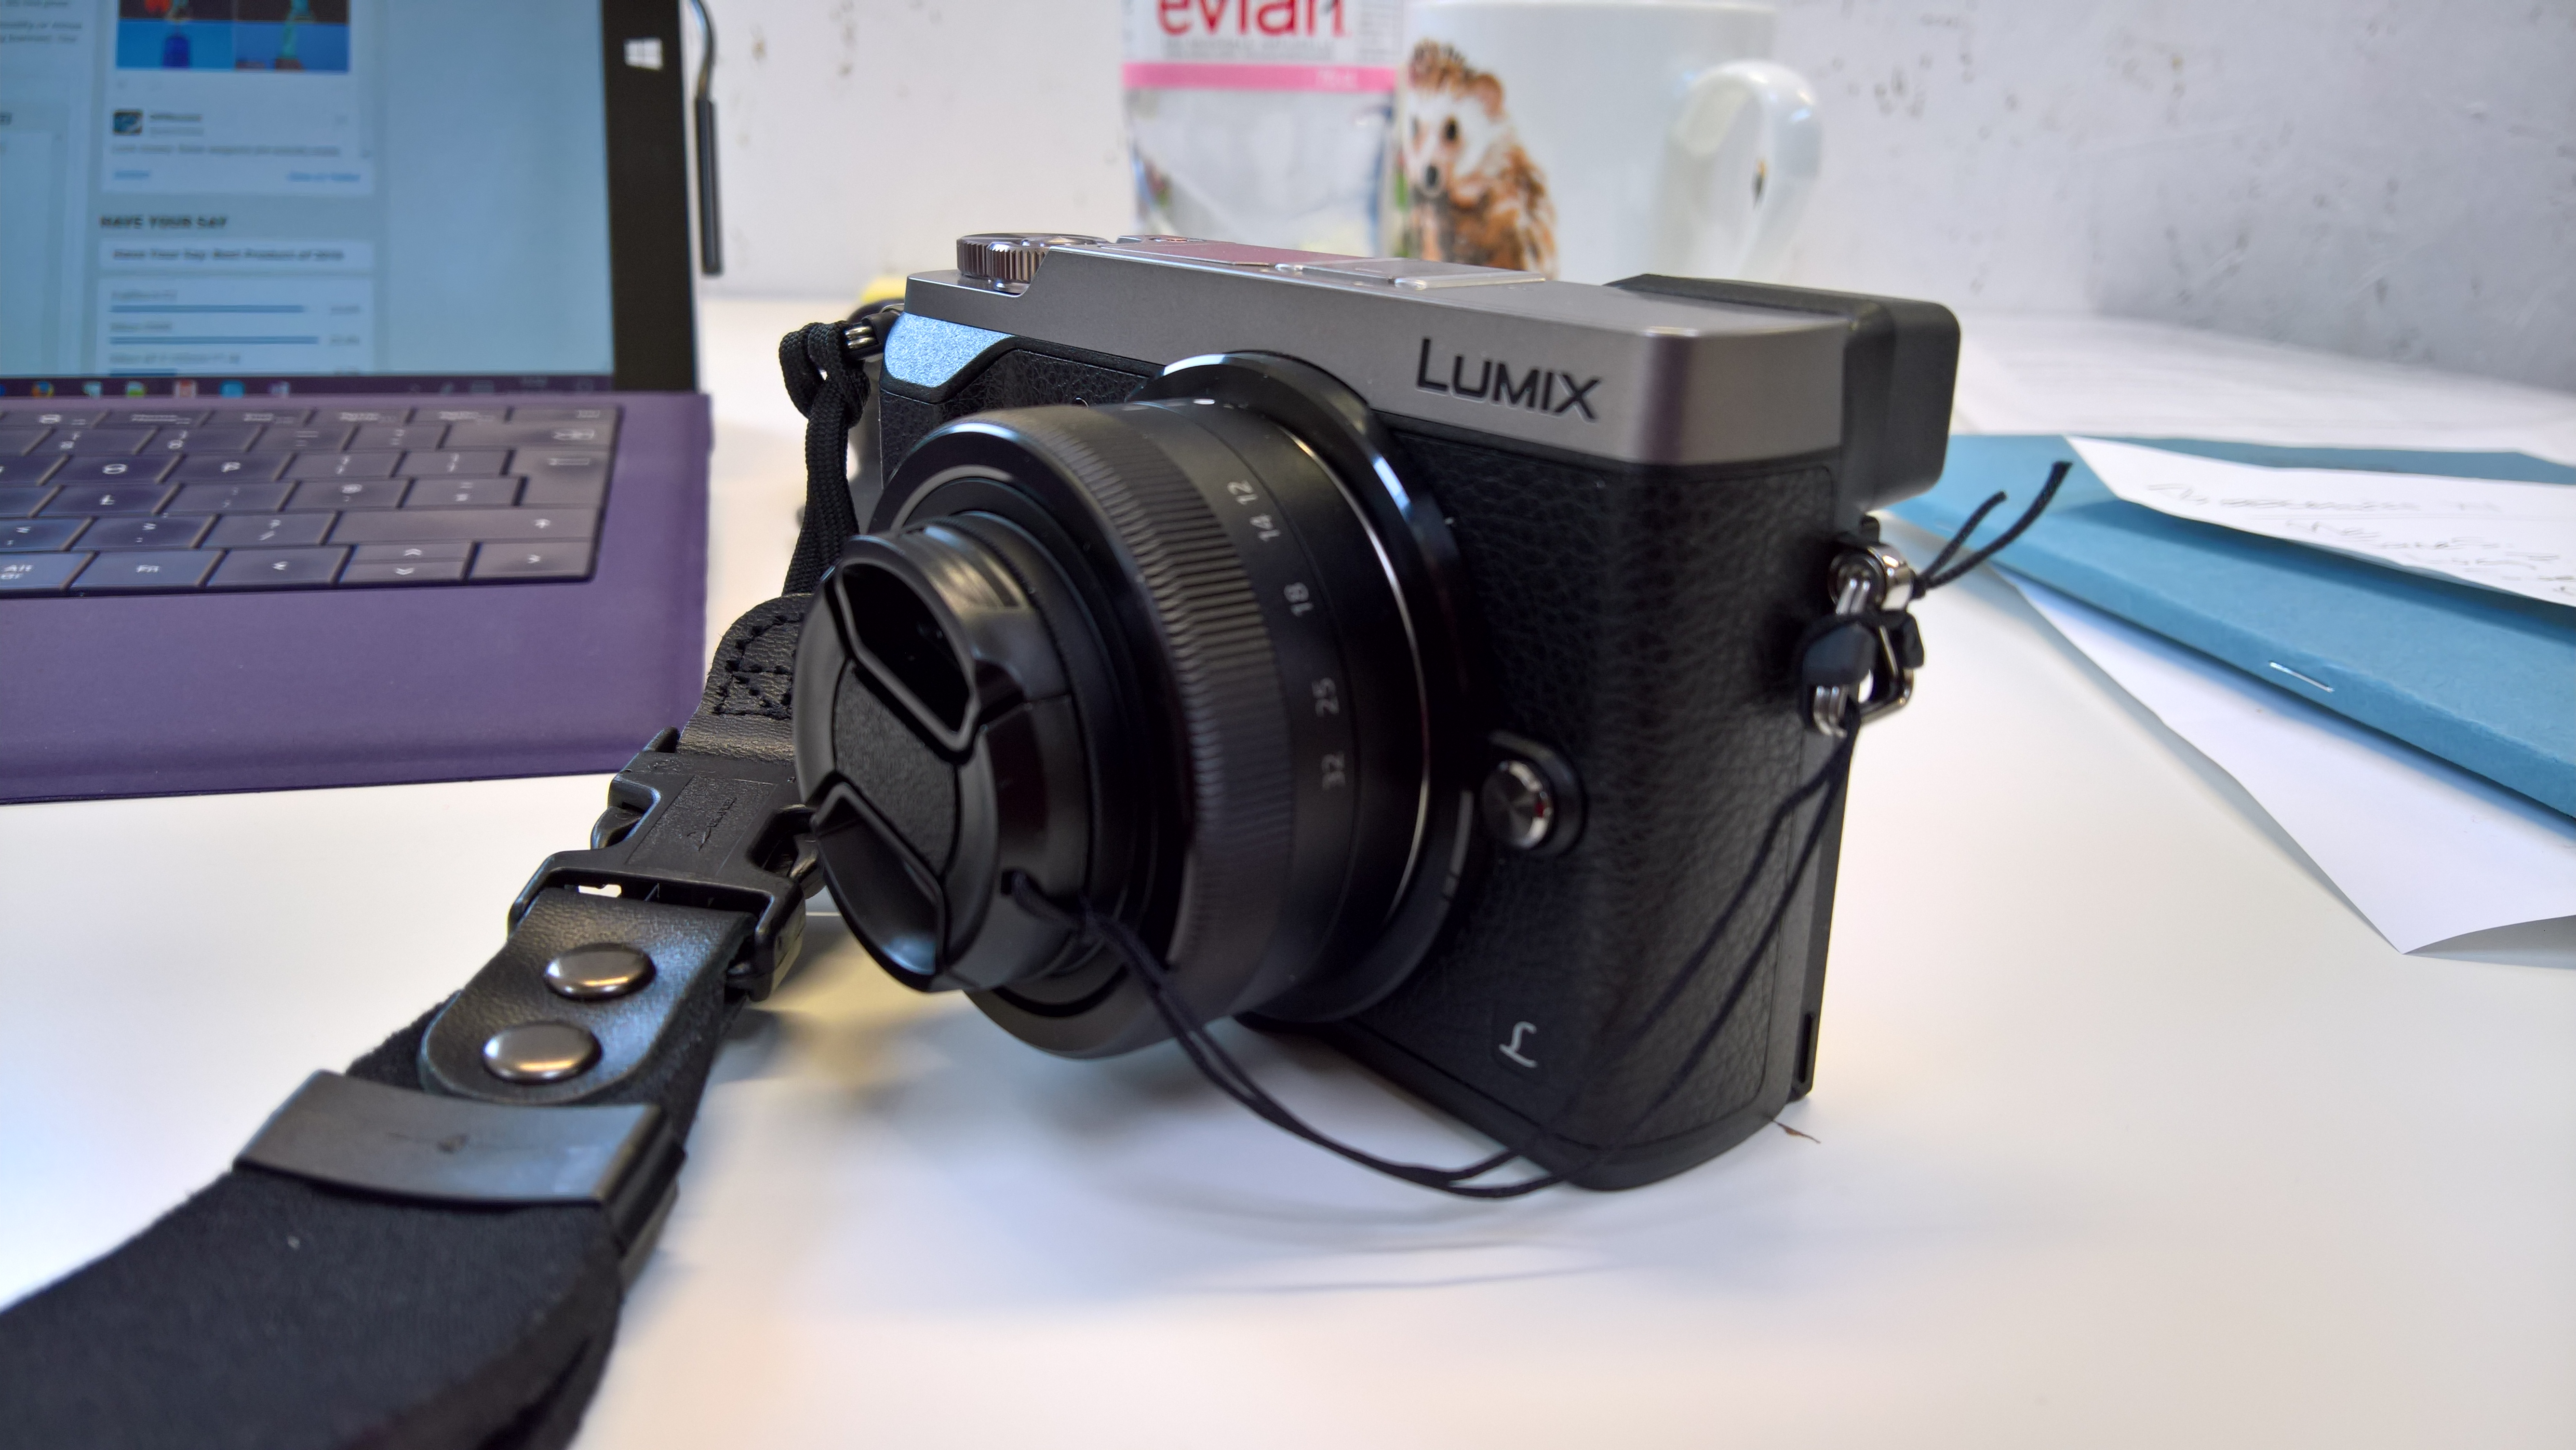 Gx85 With Kit Lens And Cap Micro Four Thirds Talk Forum Panasonic Lumix Gx85k Lensa 12 32mm Kamera Dmc View Original Size